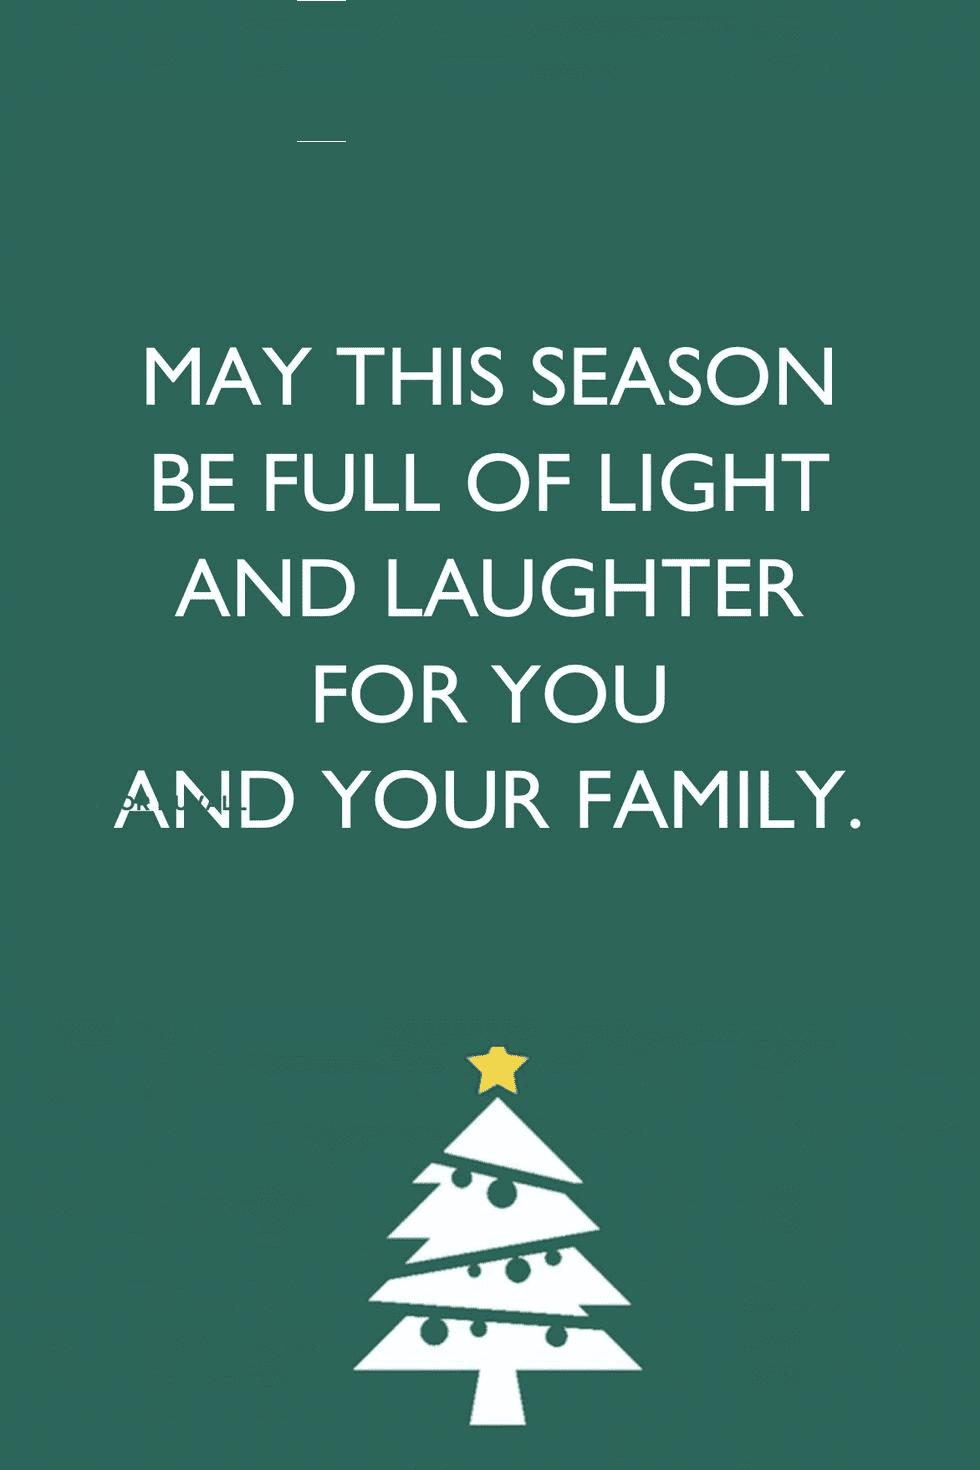 Mery Christmas Wishes 5